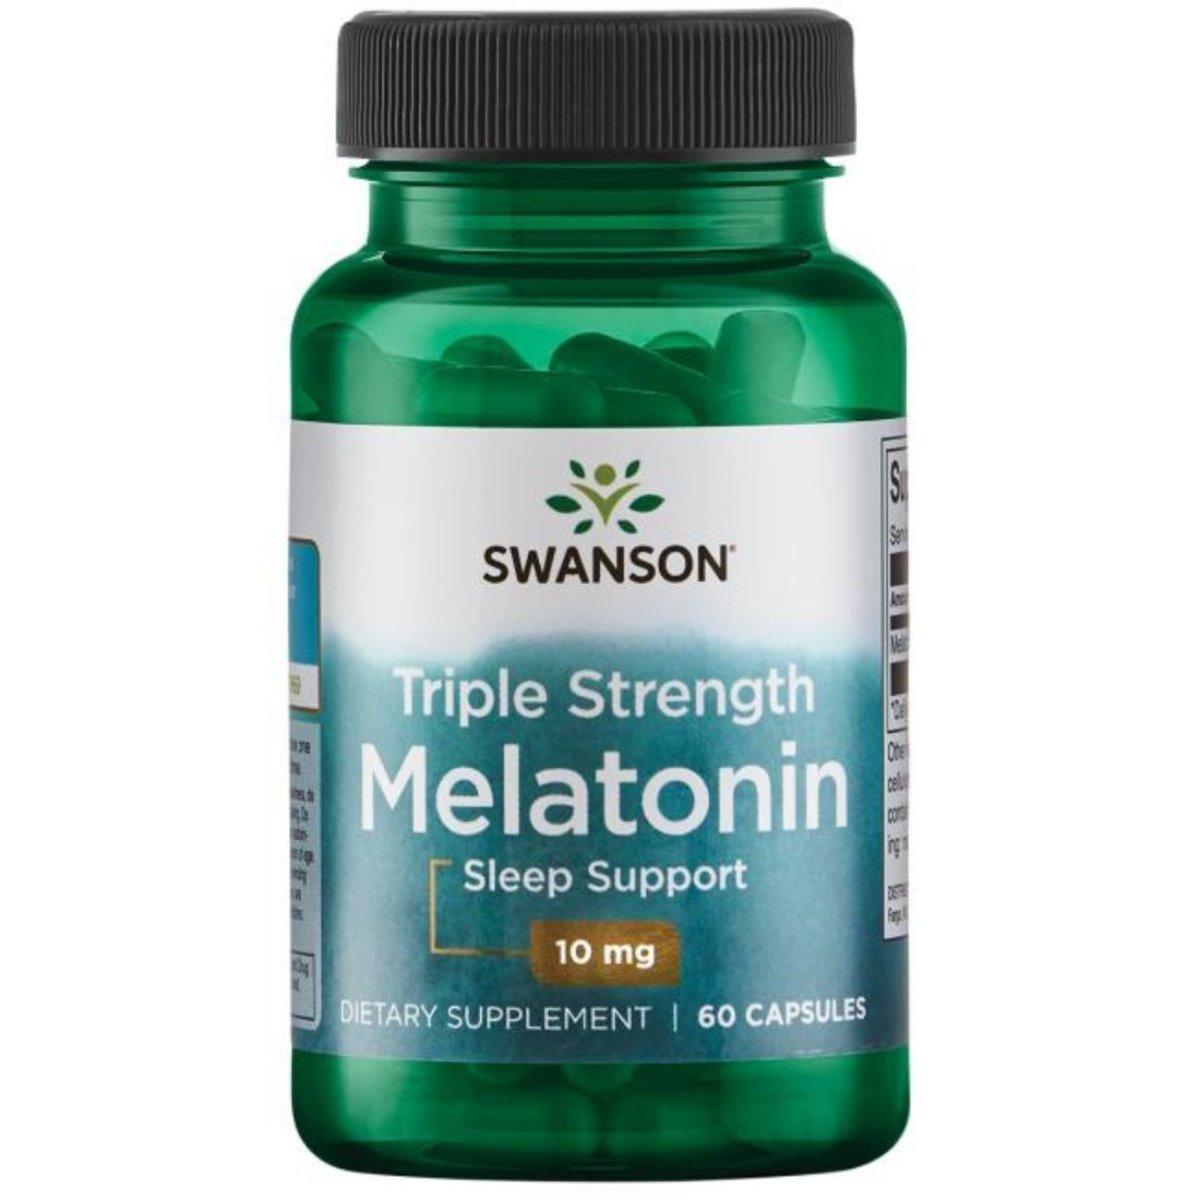 Swanson Triple Strength Melatonin 10mg 60 Capsules  (EXP: 06/2021)